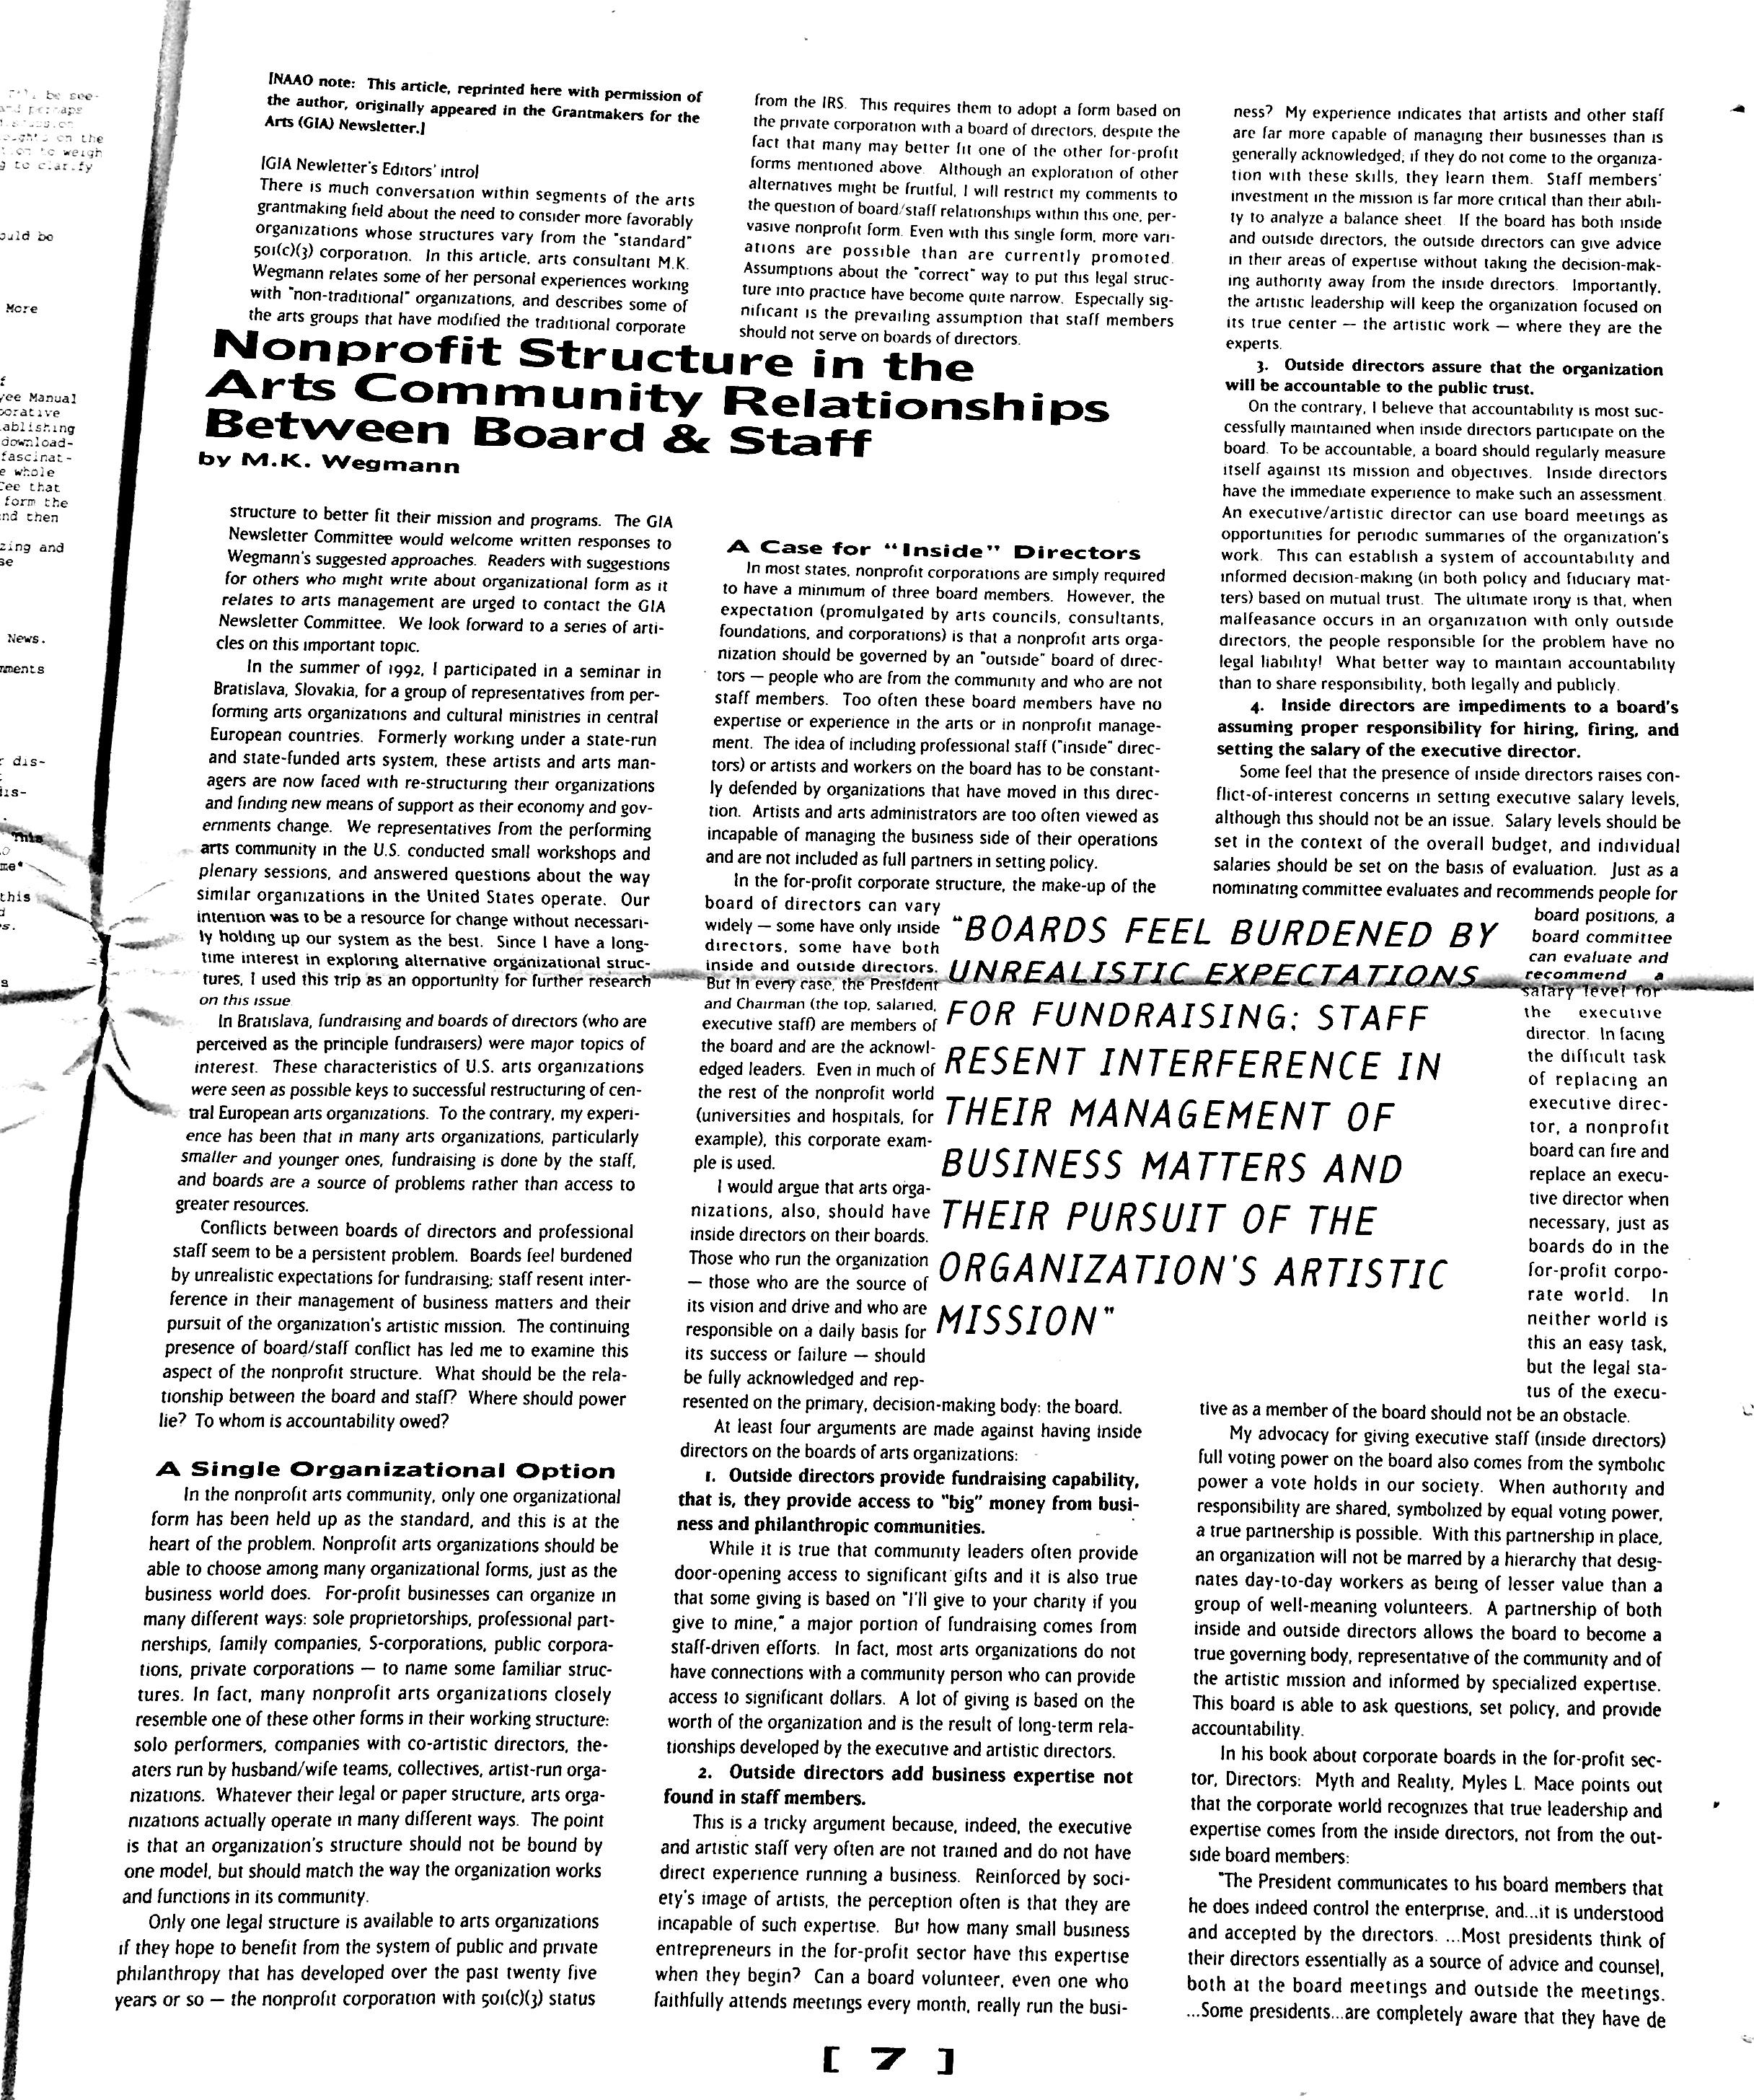 April 1993 - NAAO Bulletin Page 7.jpg